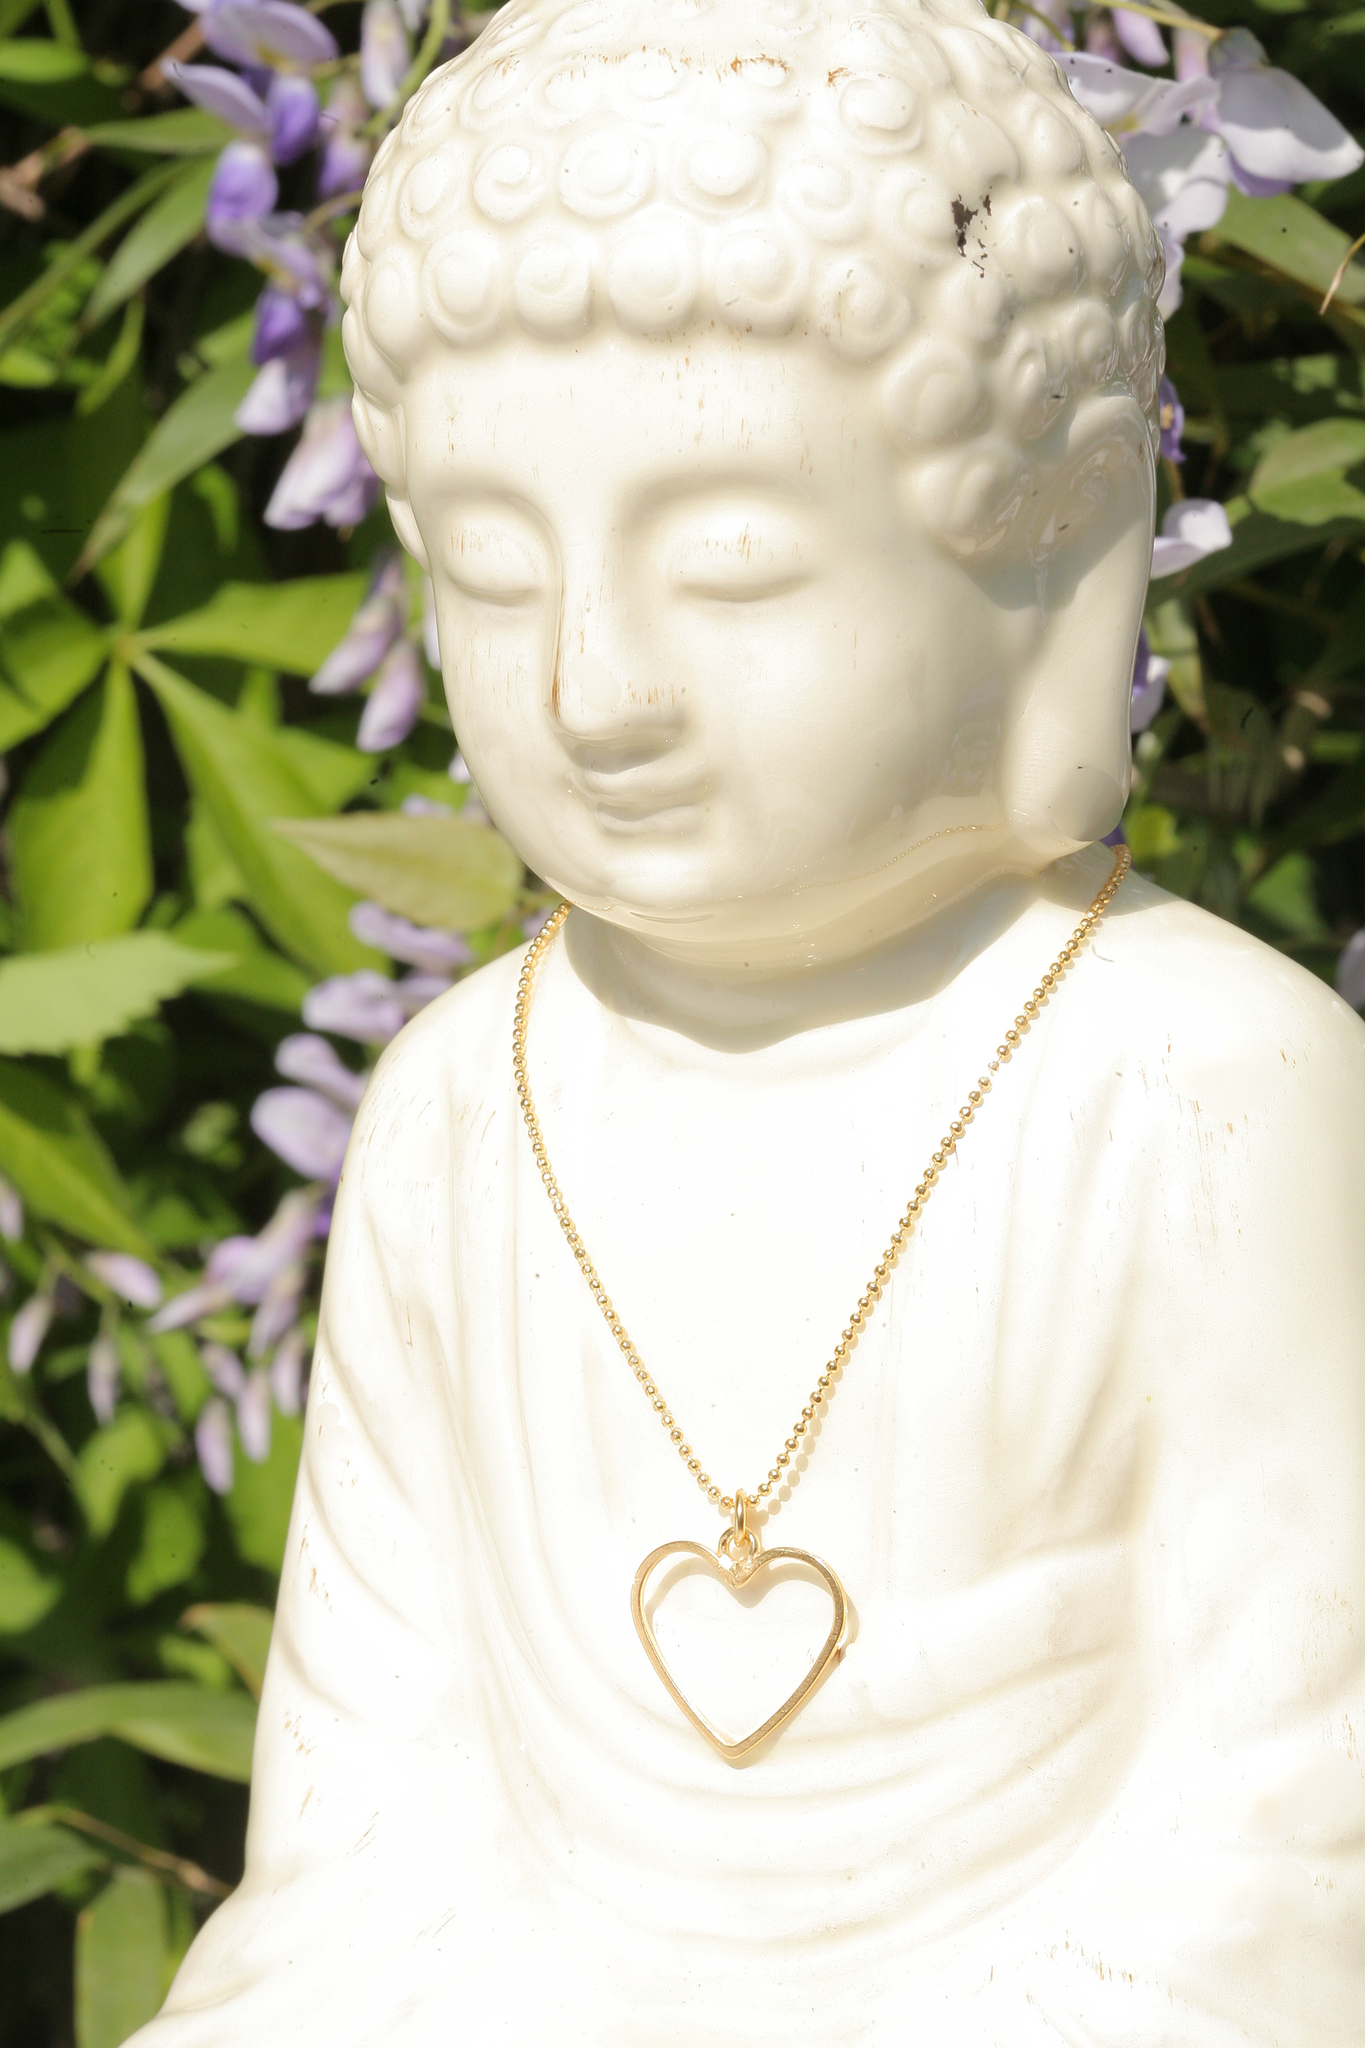 artjany vergoldete Halskette Herz